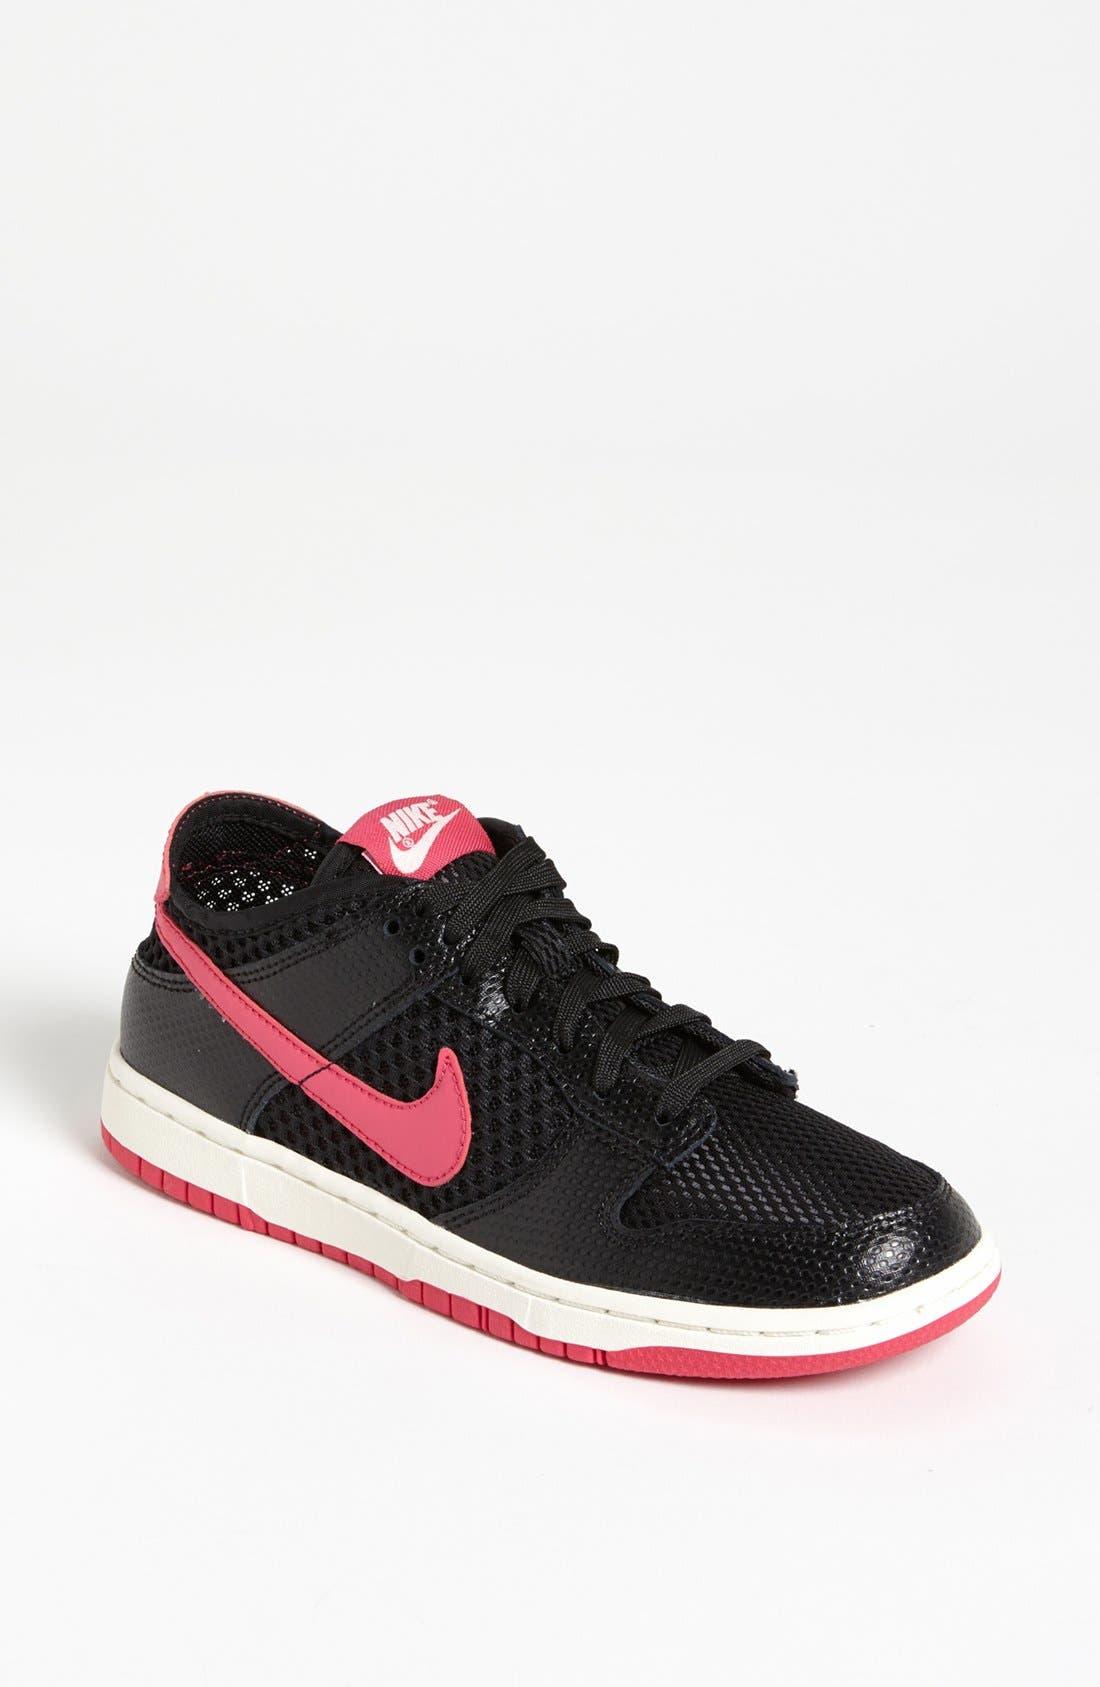 Main Image - Nike 'Dunk Low' Sneaker (Women)